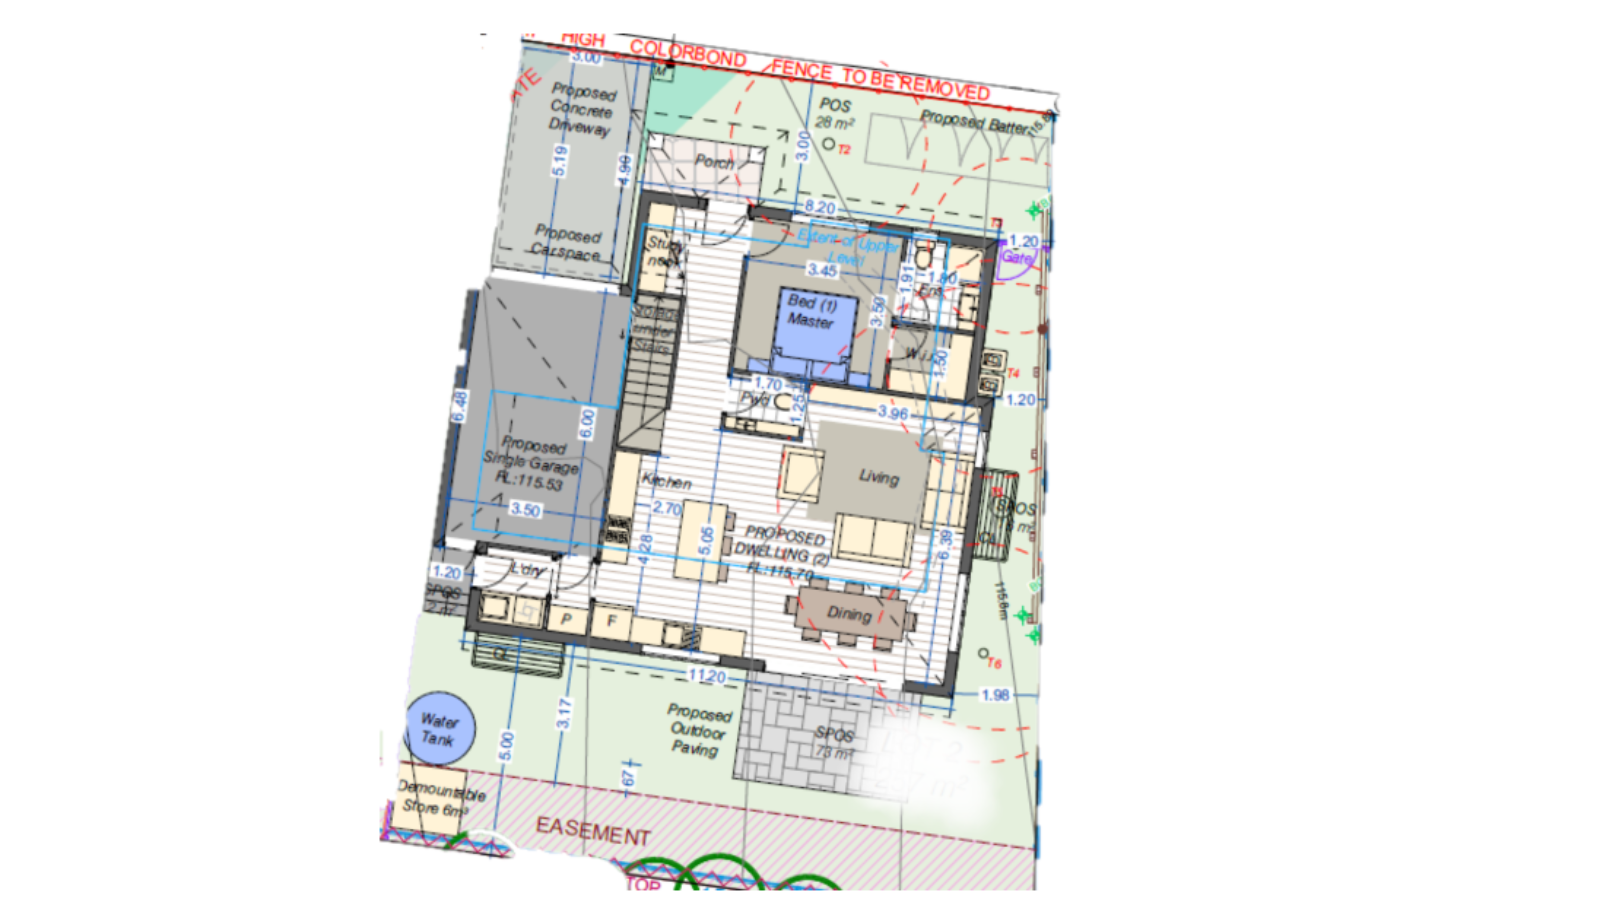 Review my floor plan please